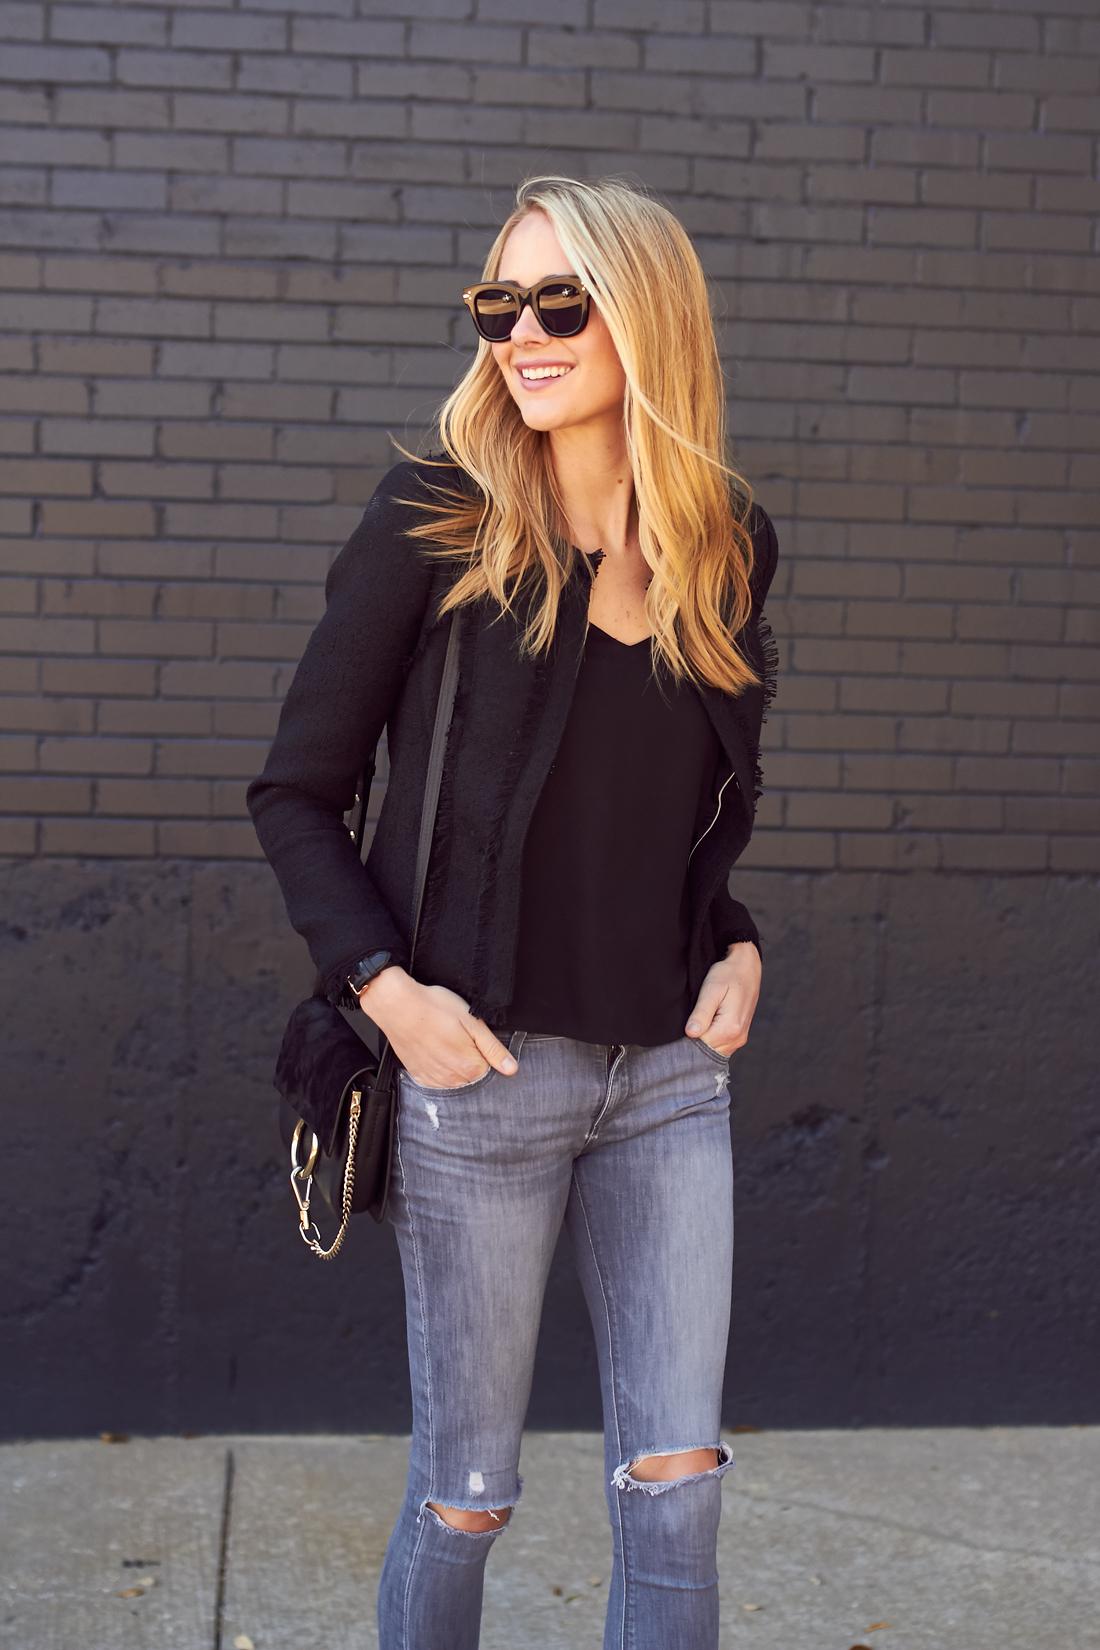 fashion-jackson-black-celine-sunglasses-black-tweed-jacket-grey-ripped-skinny-jeans